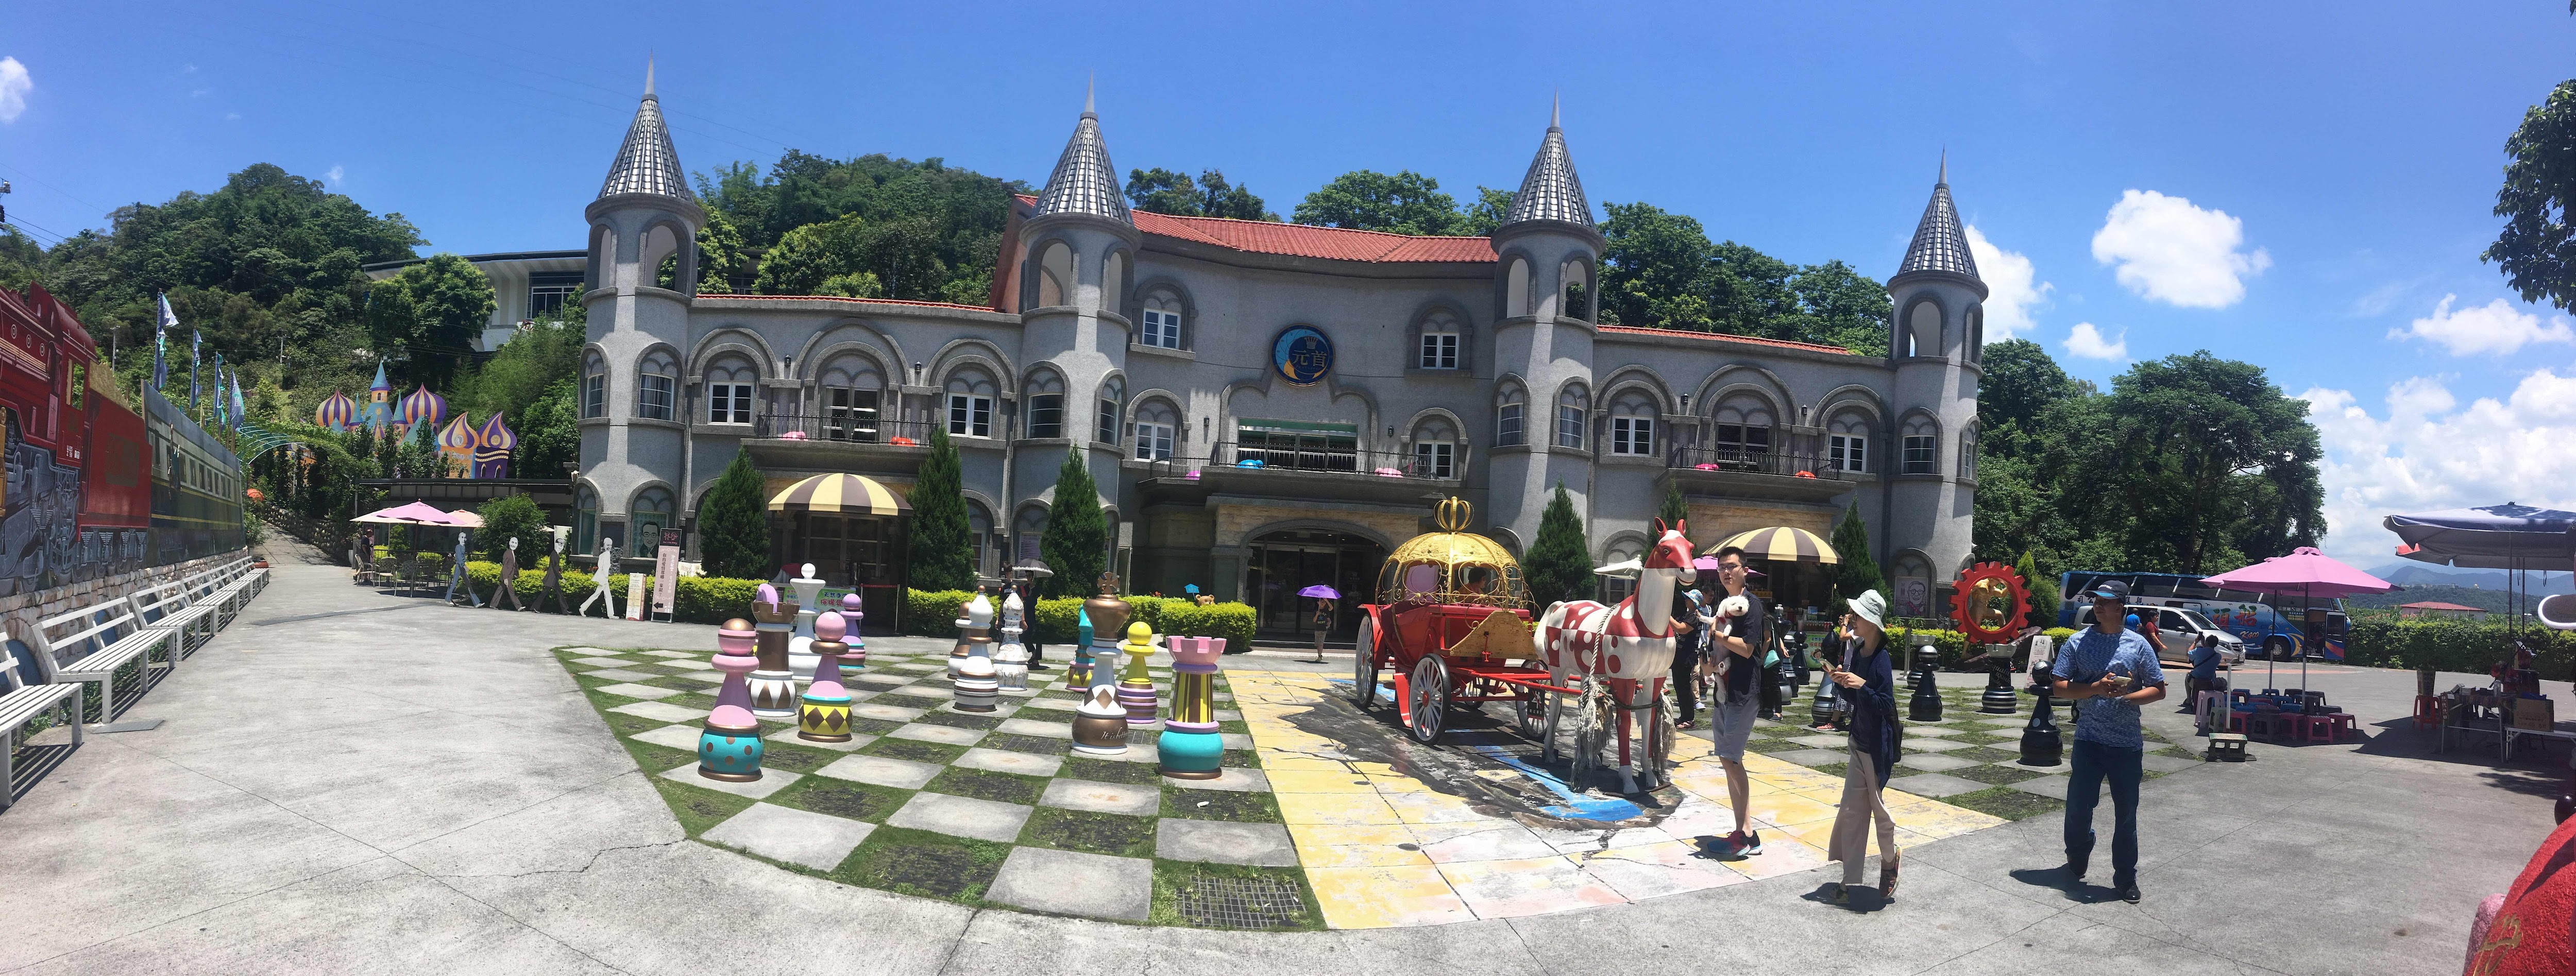 king's garden themed bakery puli nantou Taiwan